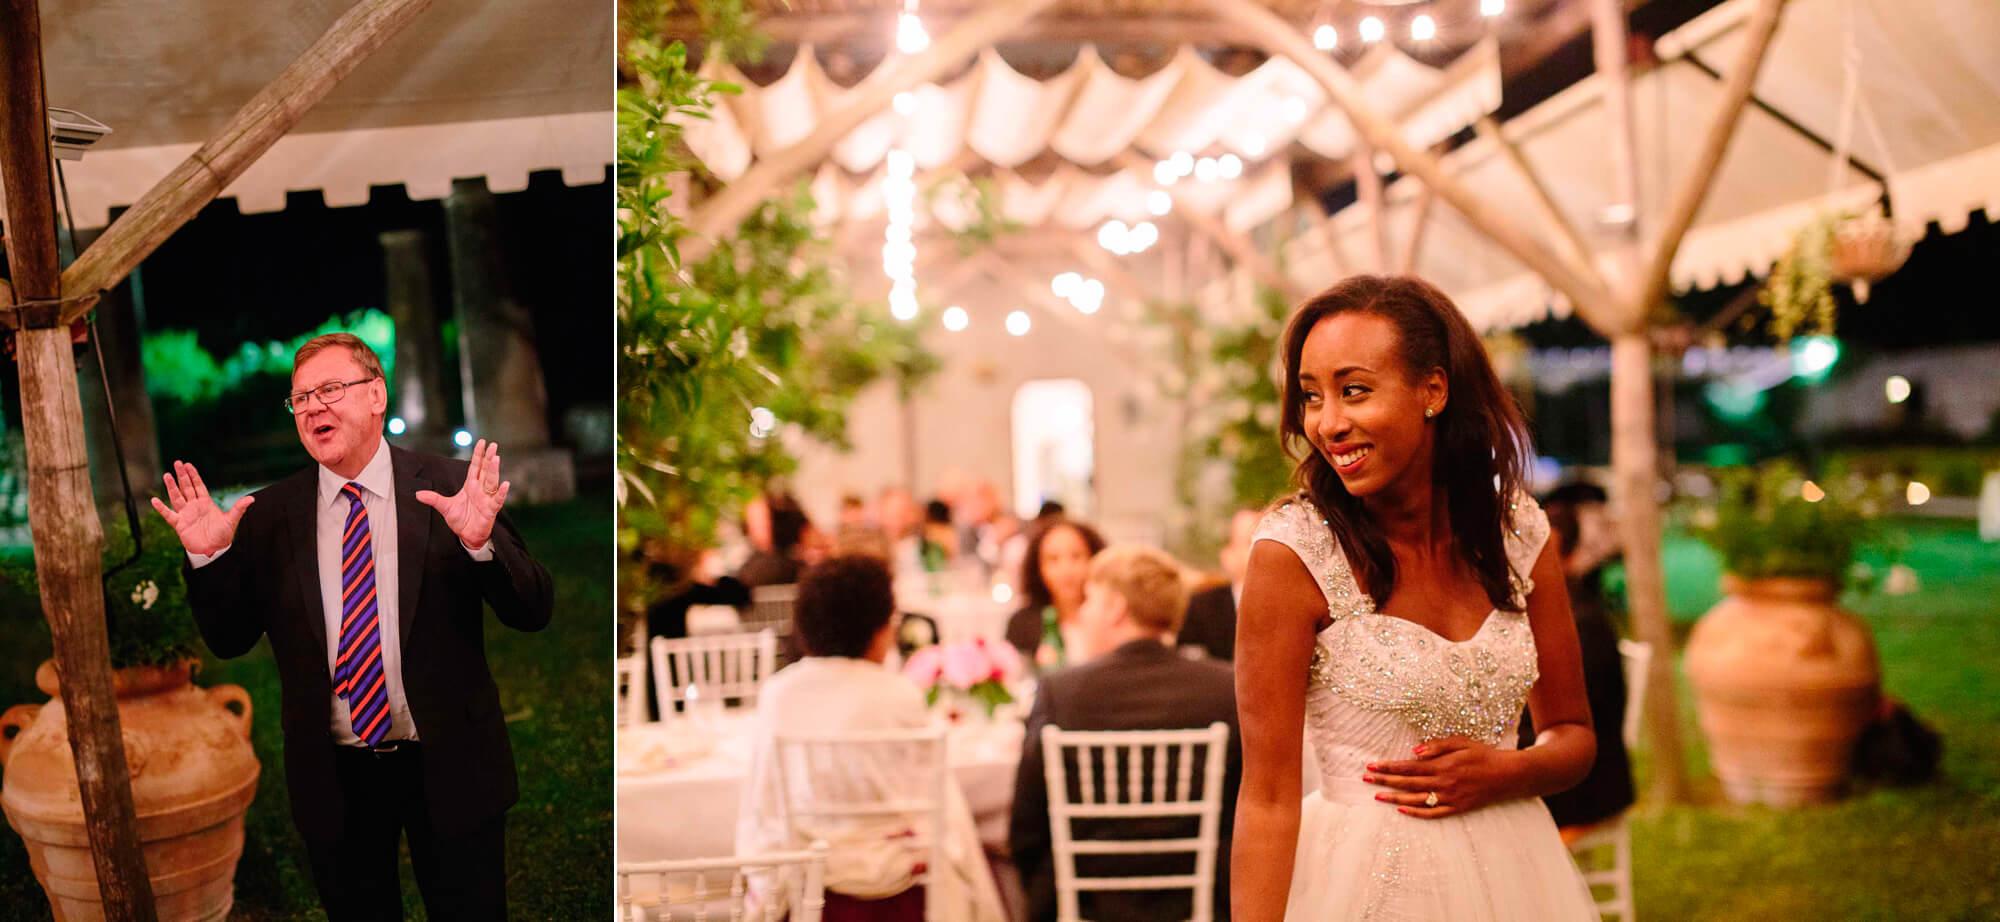 155-sorrento-wedding-photographer.jpg